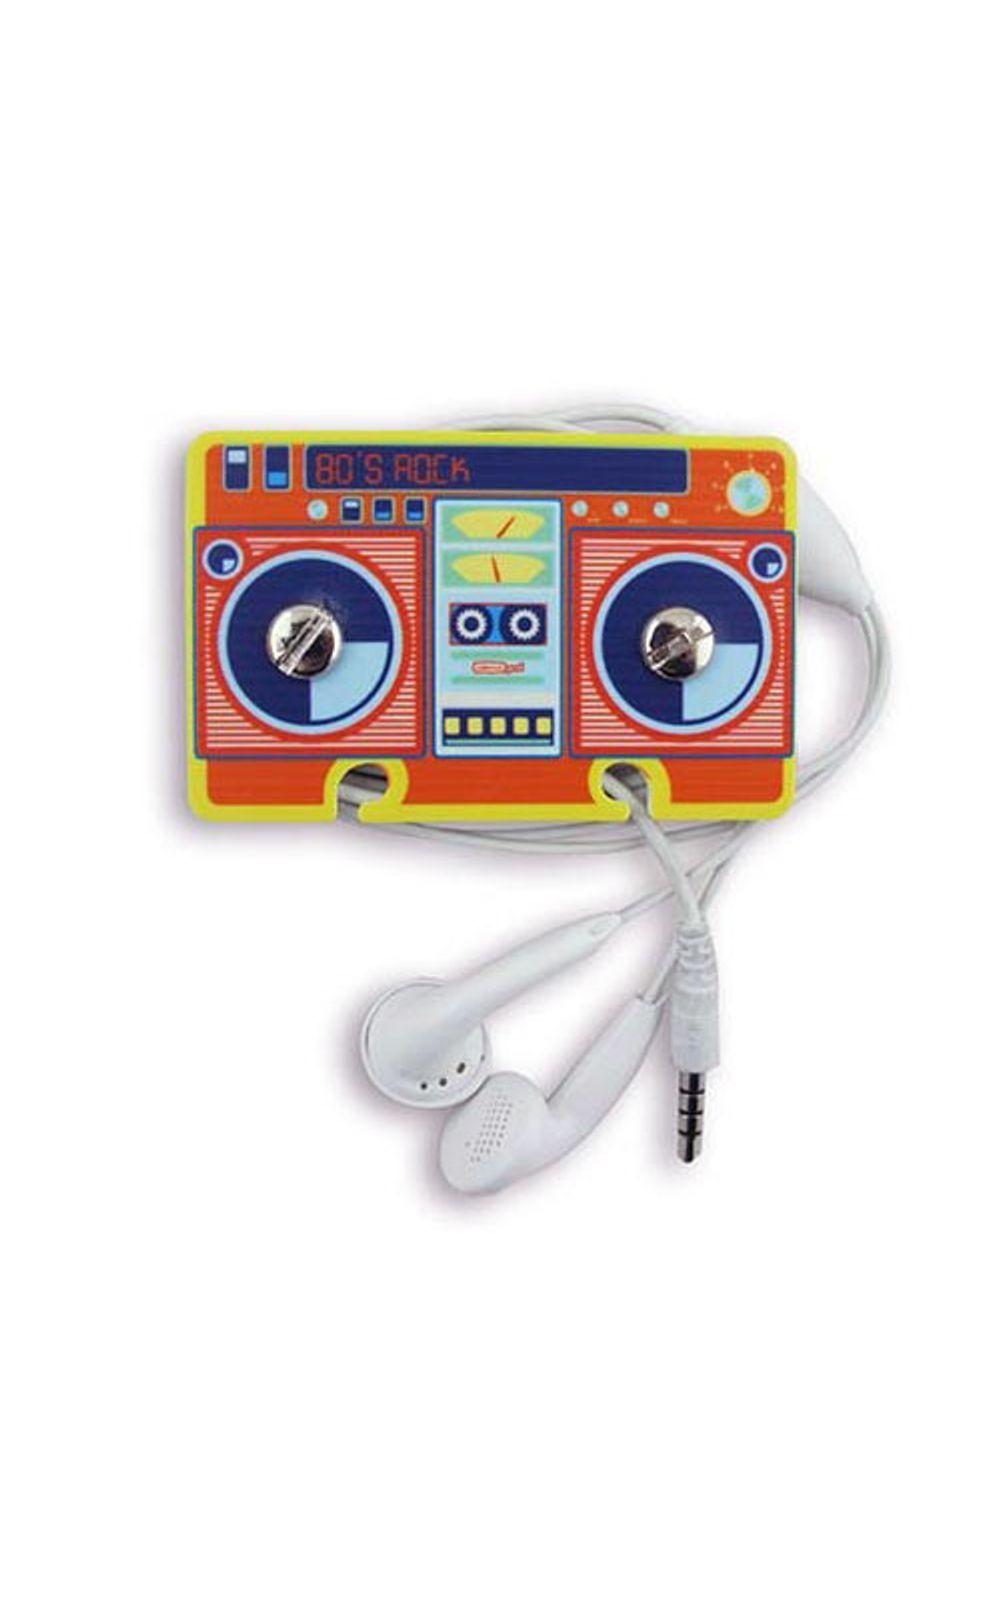 Foto 2 - Organizador de Fio Rádio Retrô